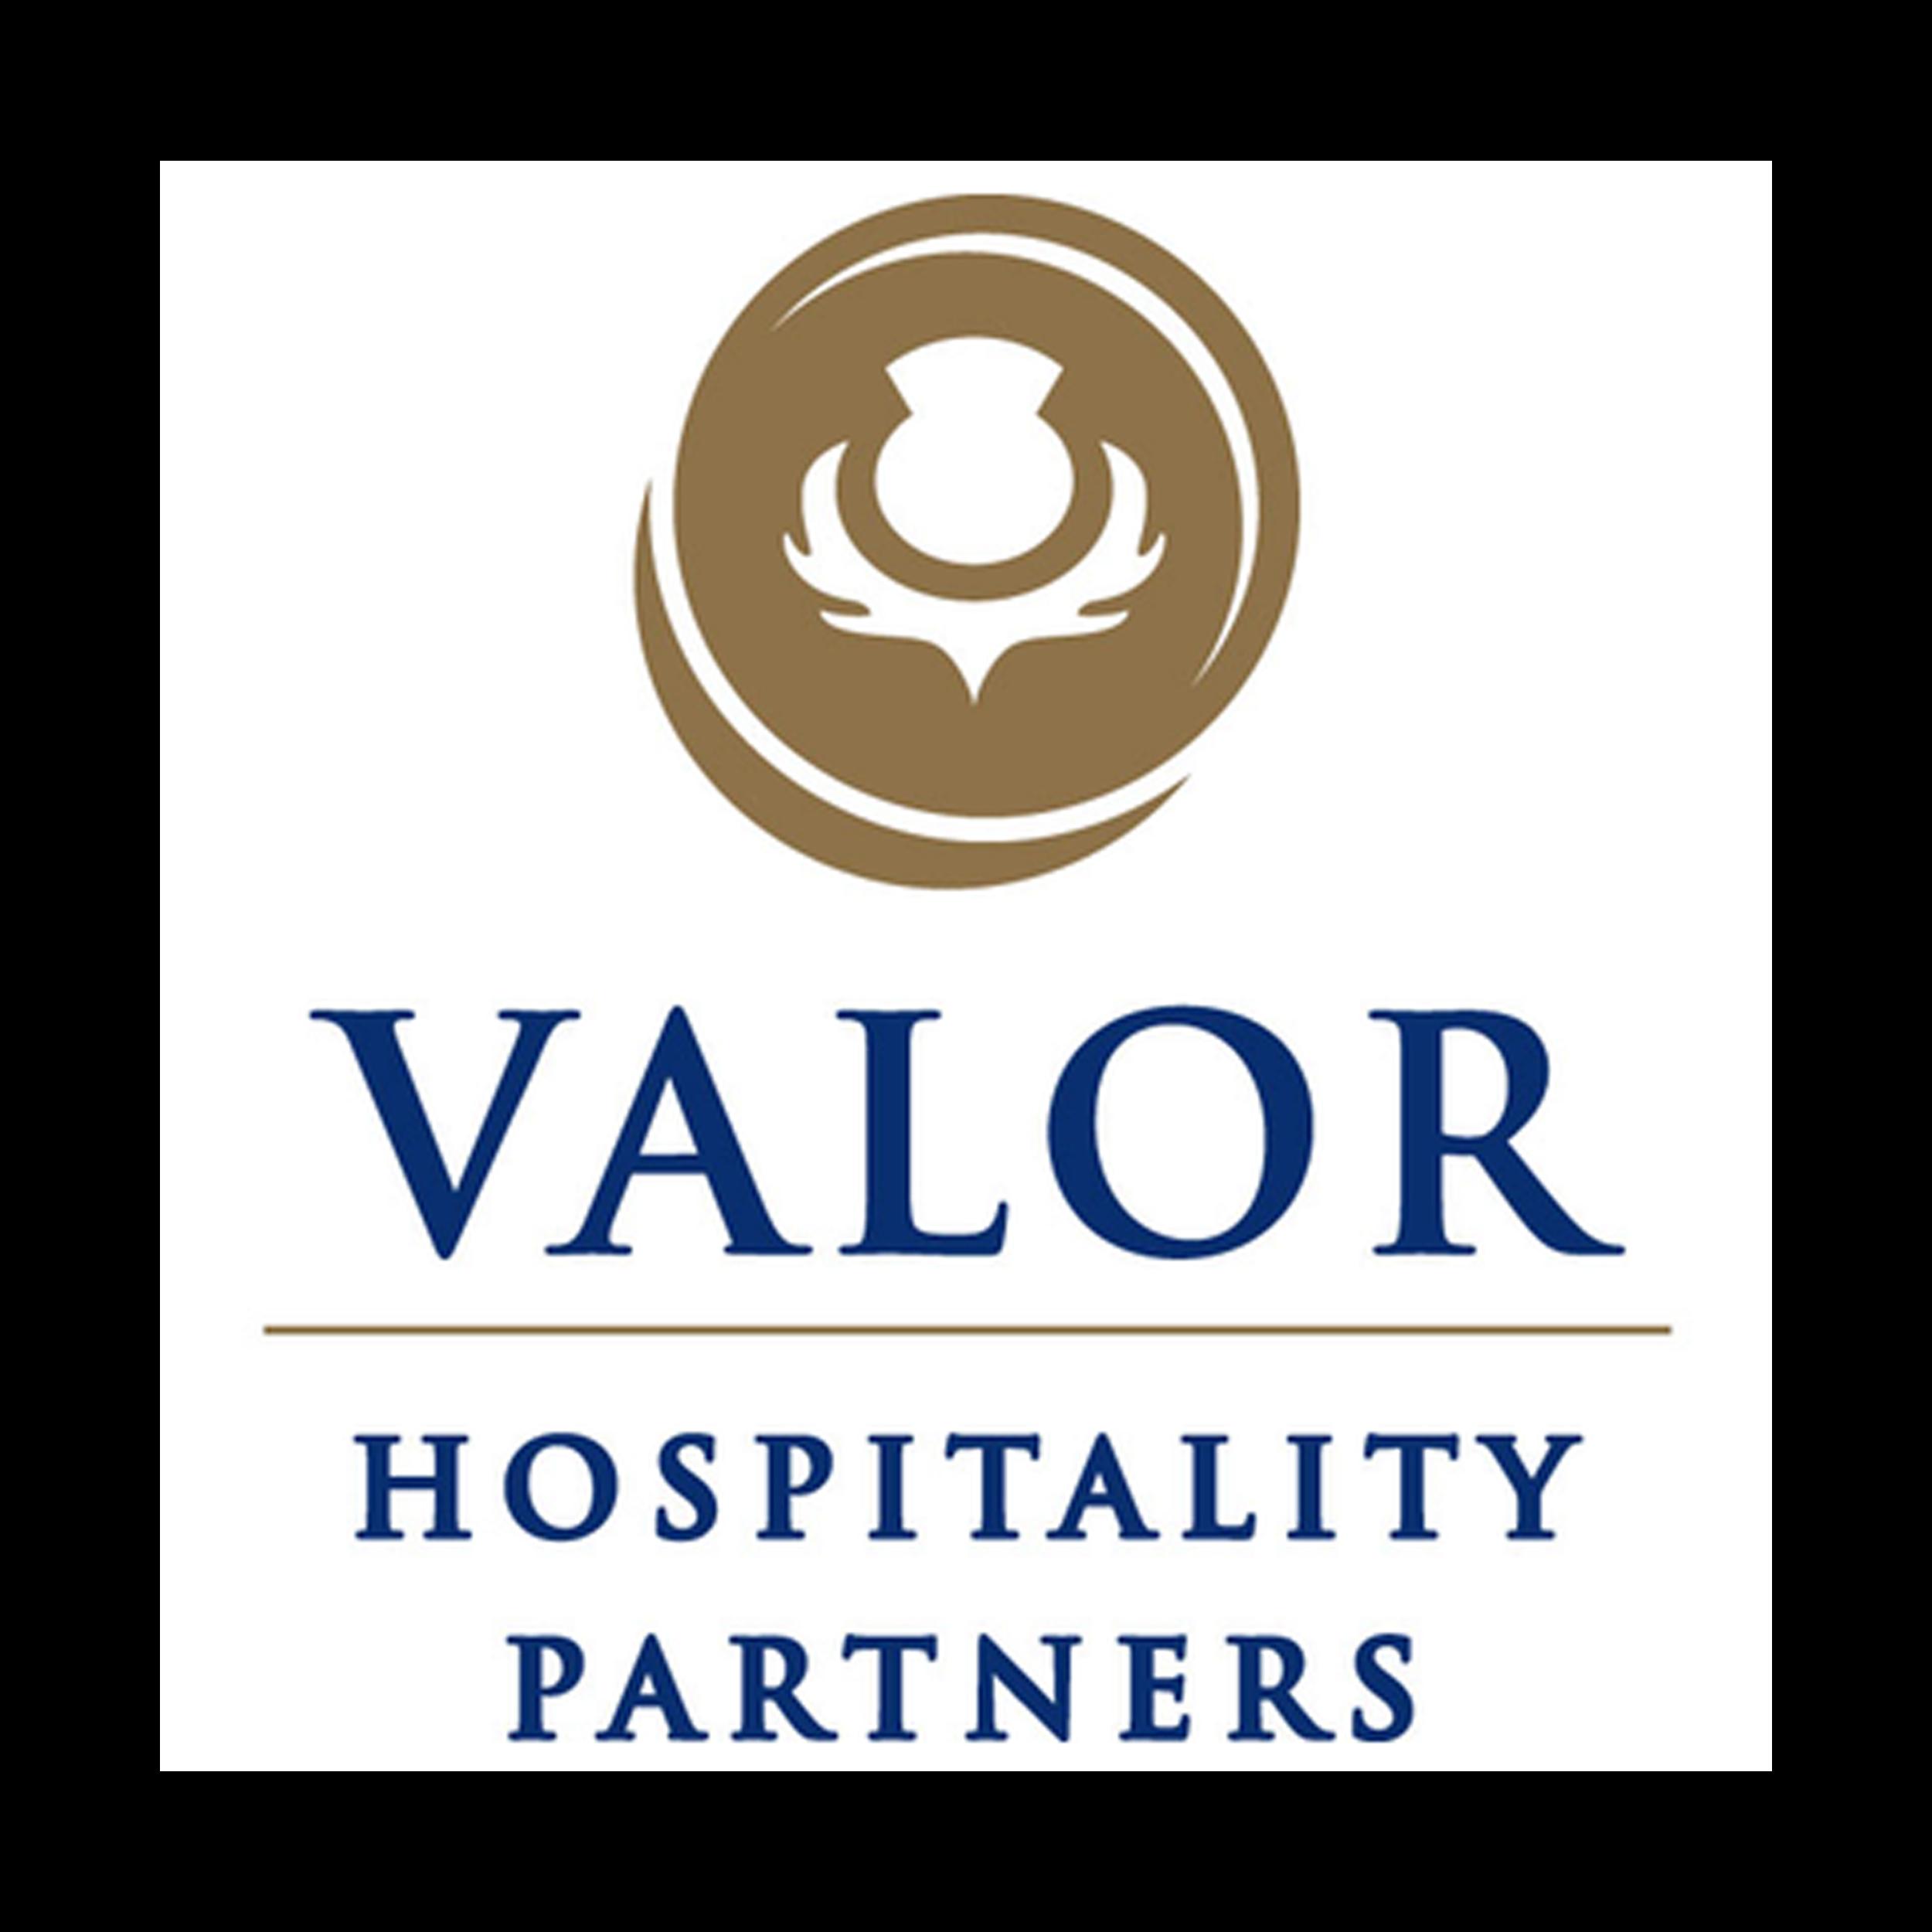 Valor Hospitality Partners